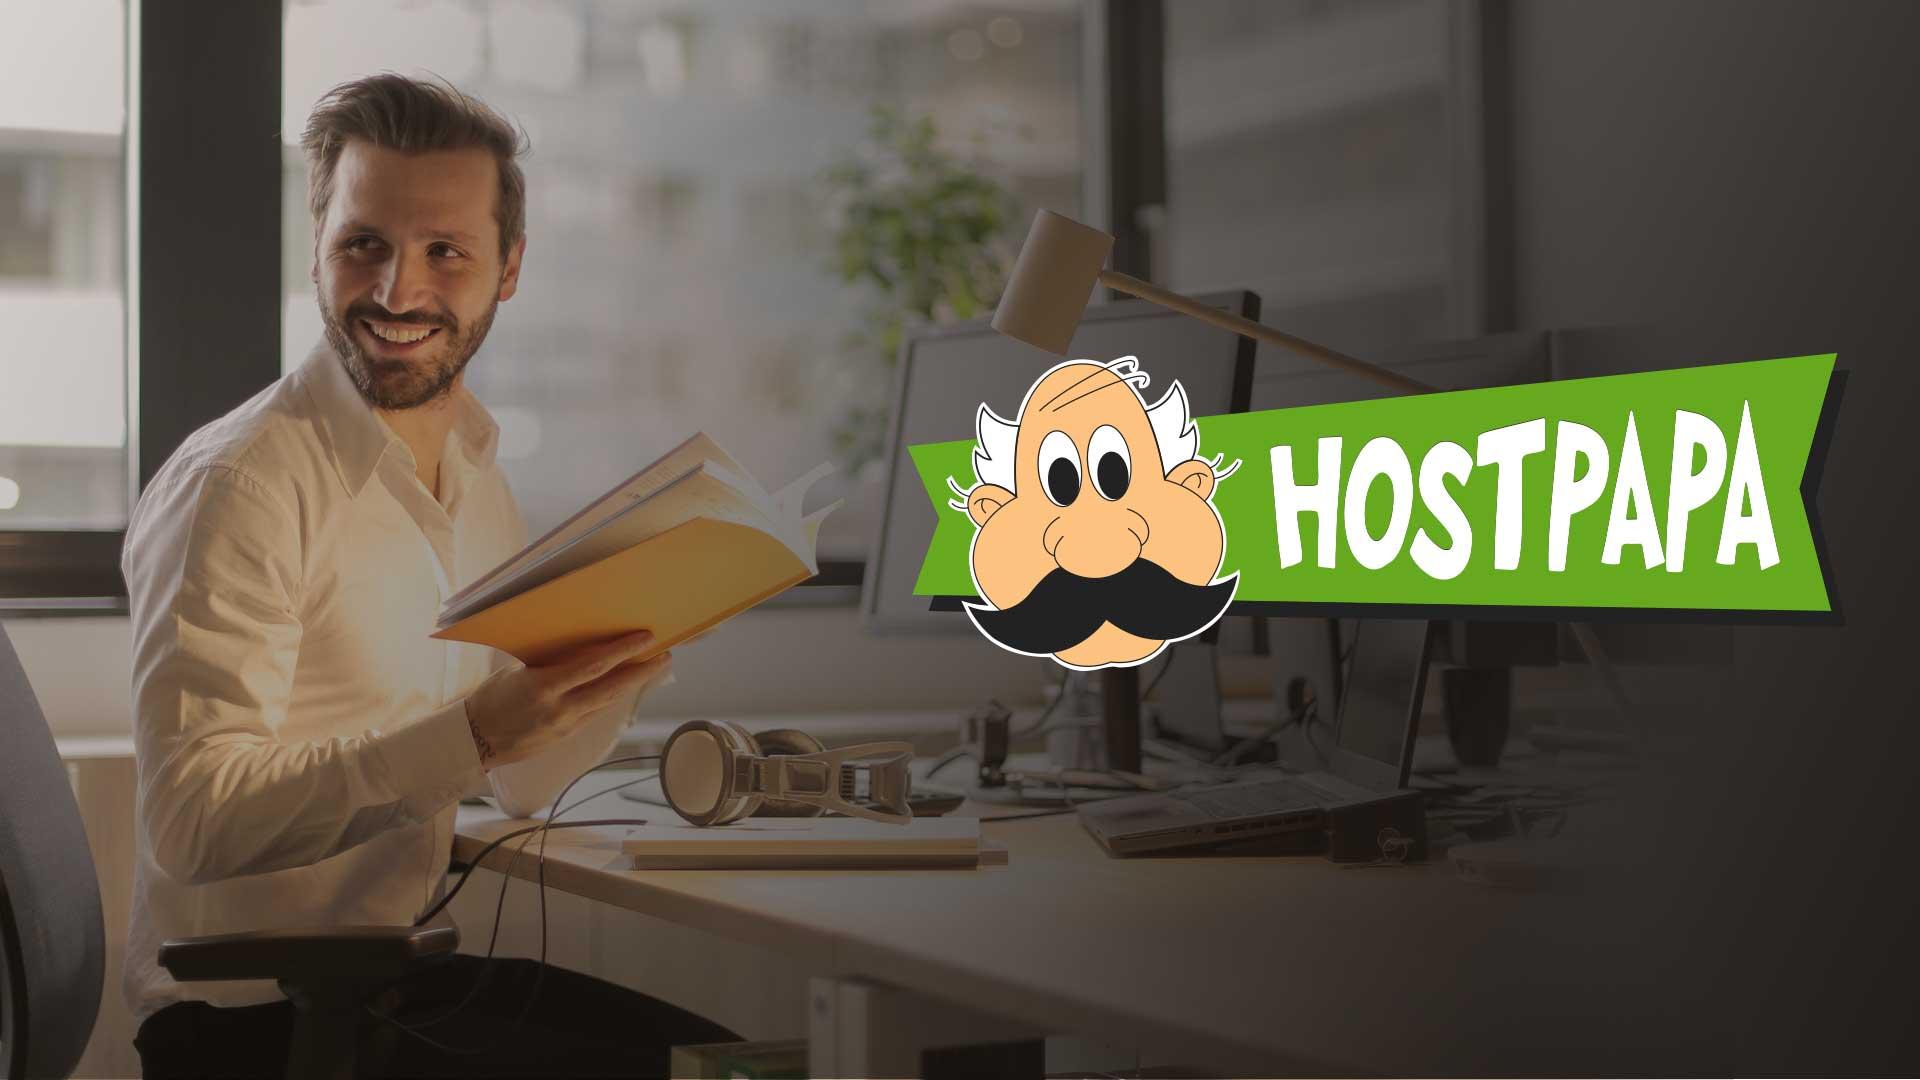 VPS Hosting America | Managed Linux VPS Hosting | HostPapa